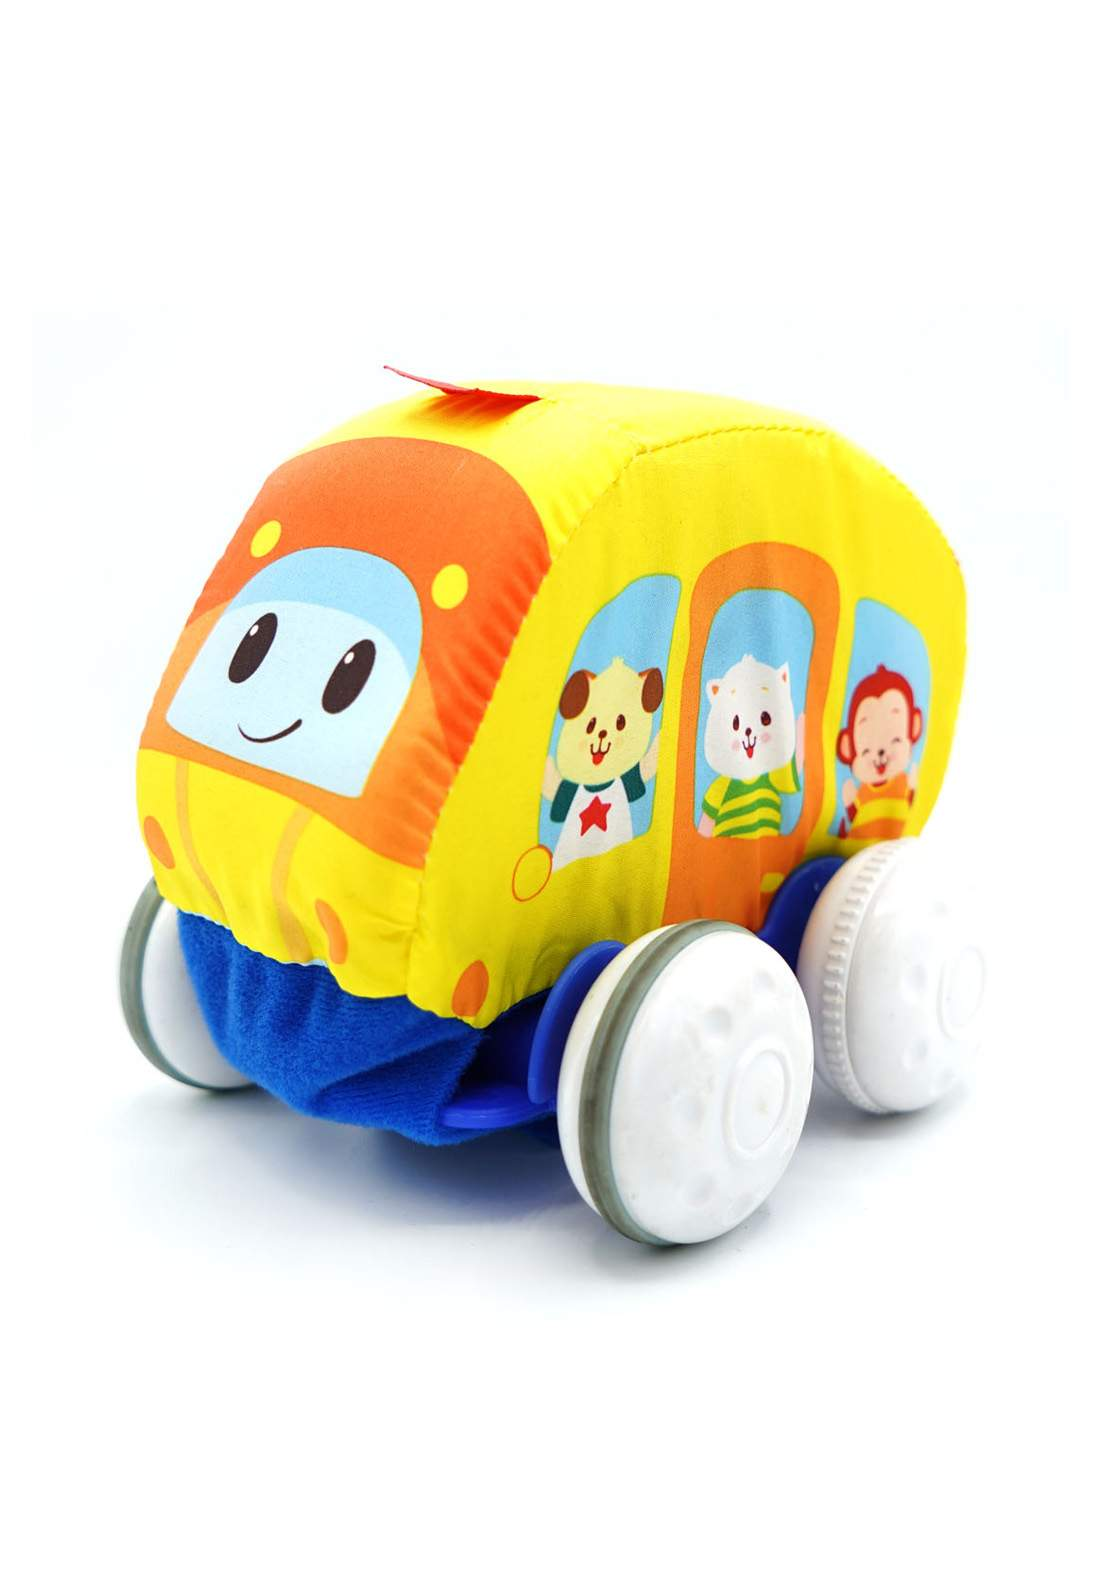 Winfun On The Go Pull Back Action Car +6M  سيارة أطفال متحركة